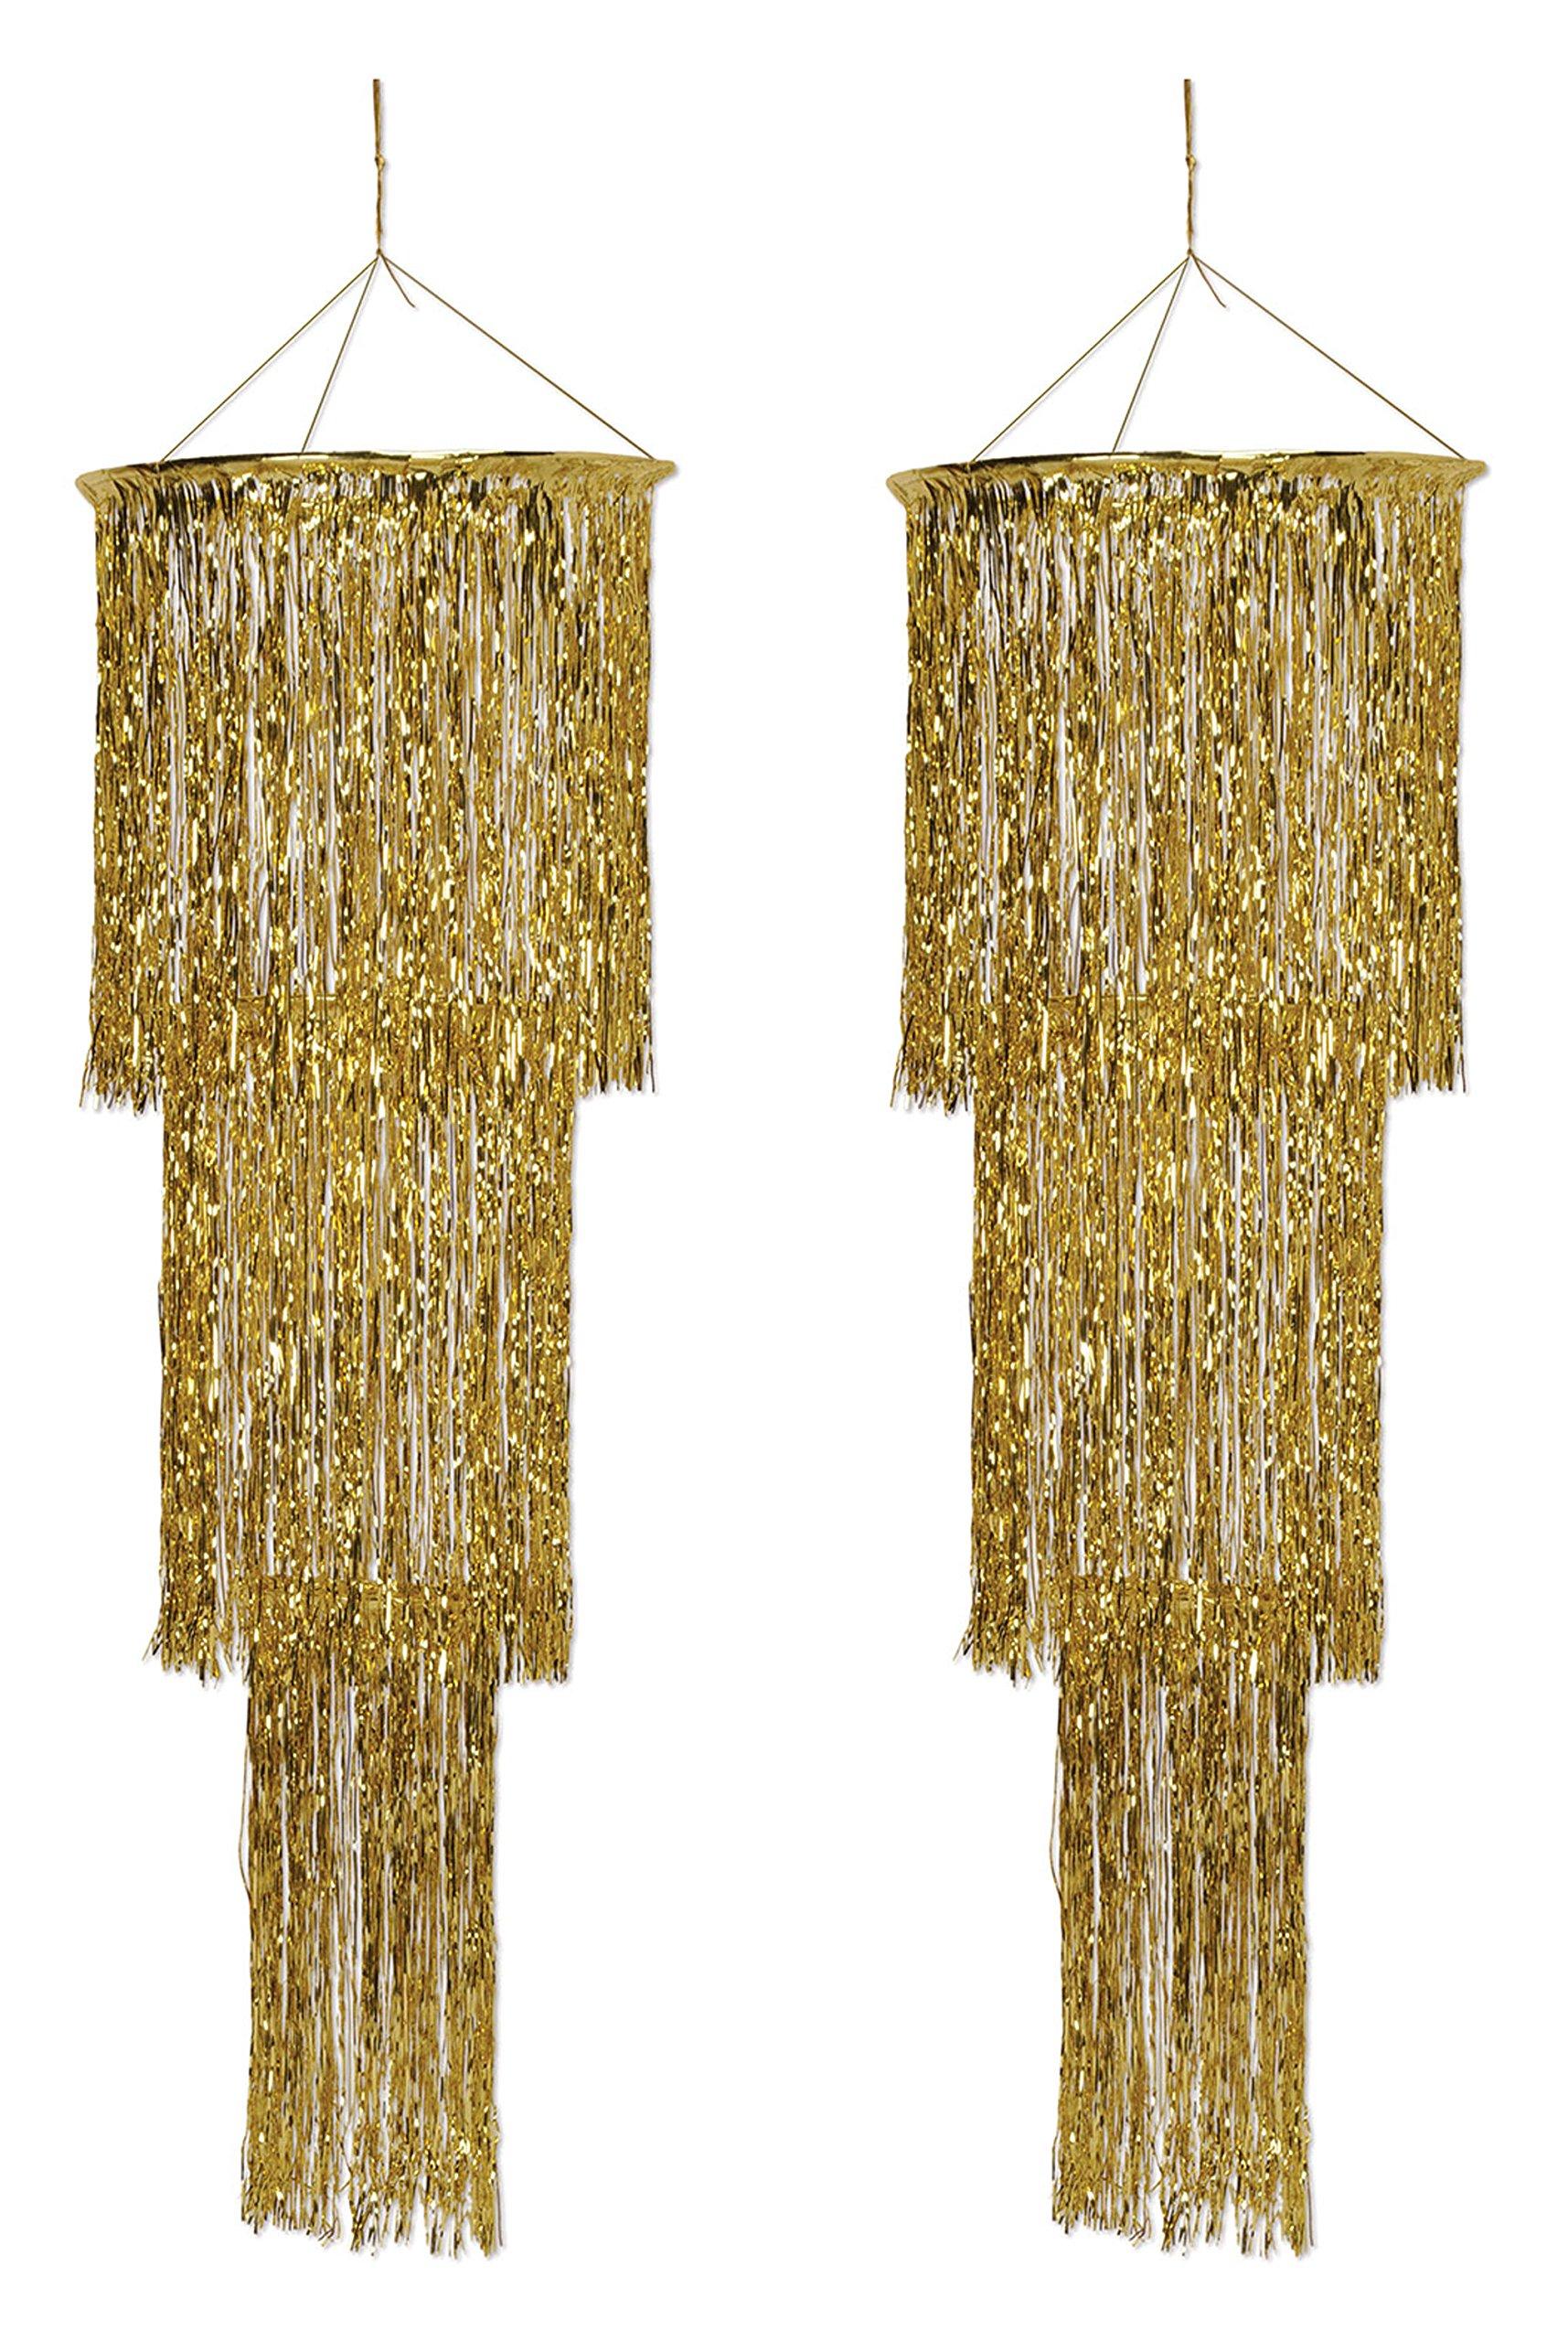 Beistle S57510-GDAZ2 3-Tier Shimmering Chandelier 2 Piece, Gold